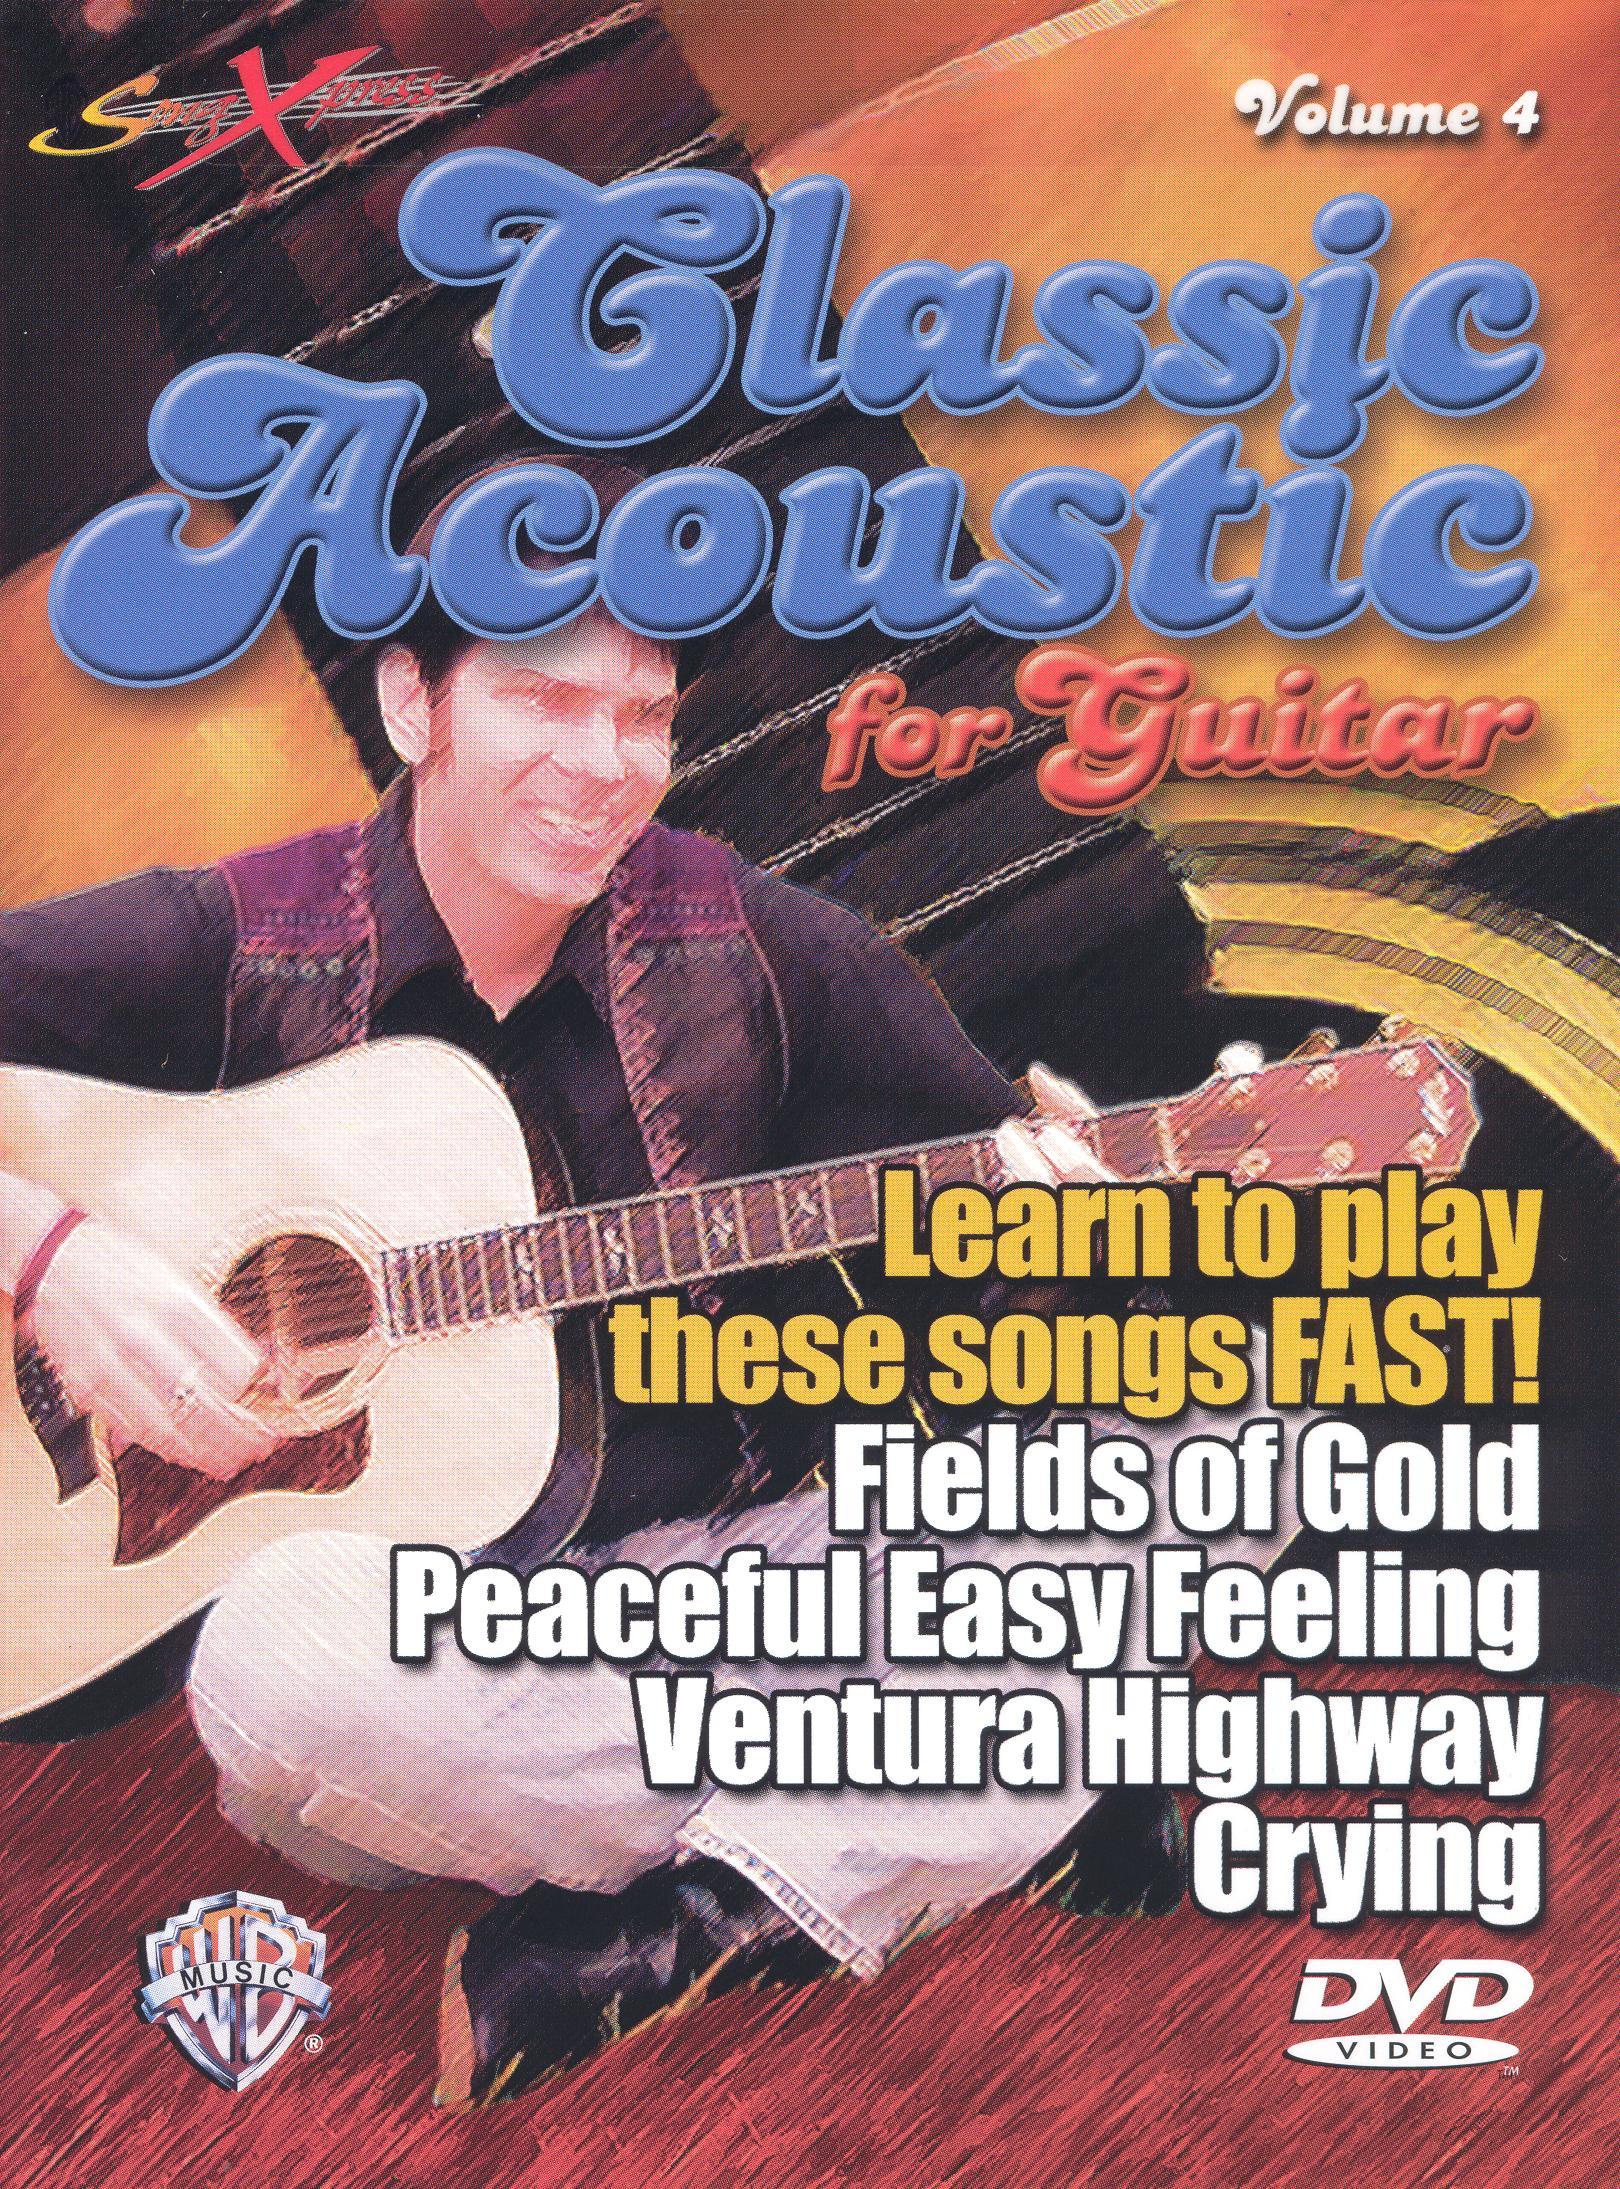 SongXpress: Classic Acoustic for Guitar, Vol. 4